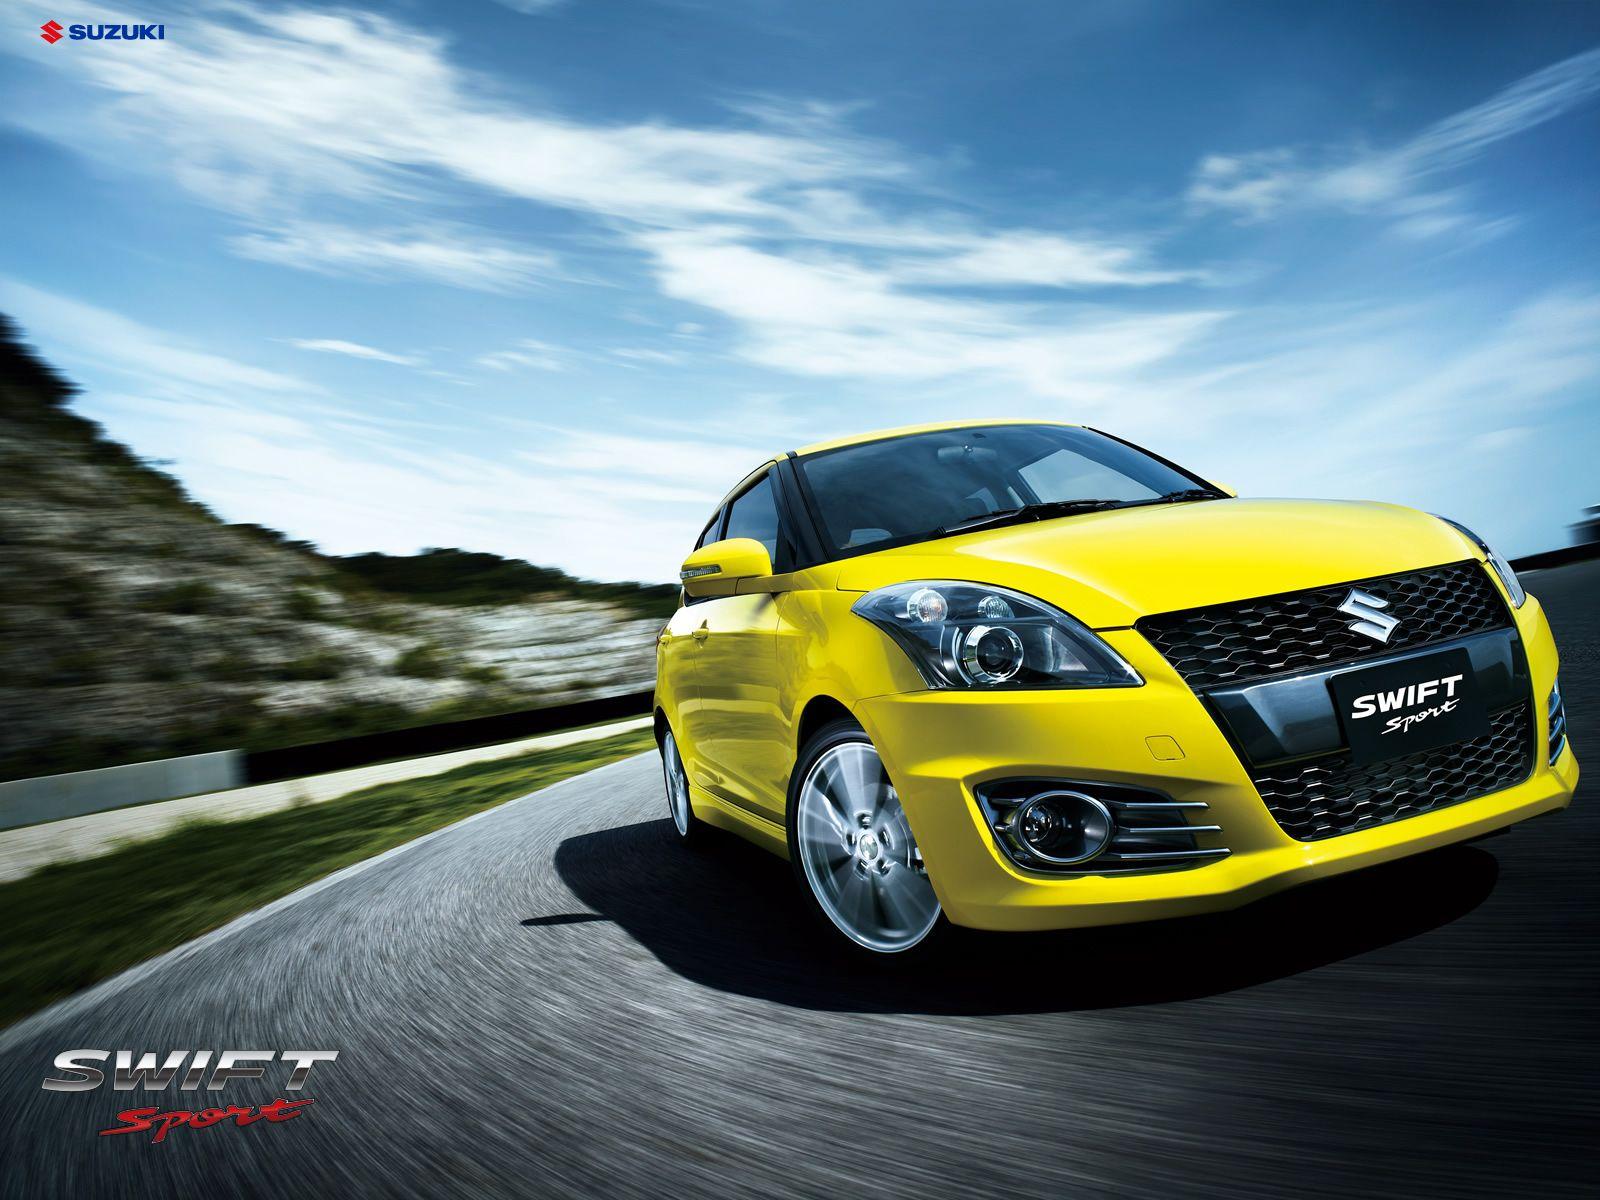 Suzuki Swift Sport Wallpaper Yellow 2 Sports Cars Wallpapers スイフト スズキ 車の壁紙 スズキ